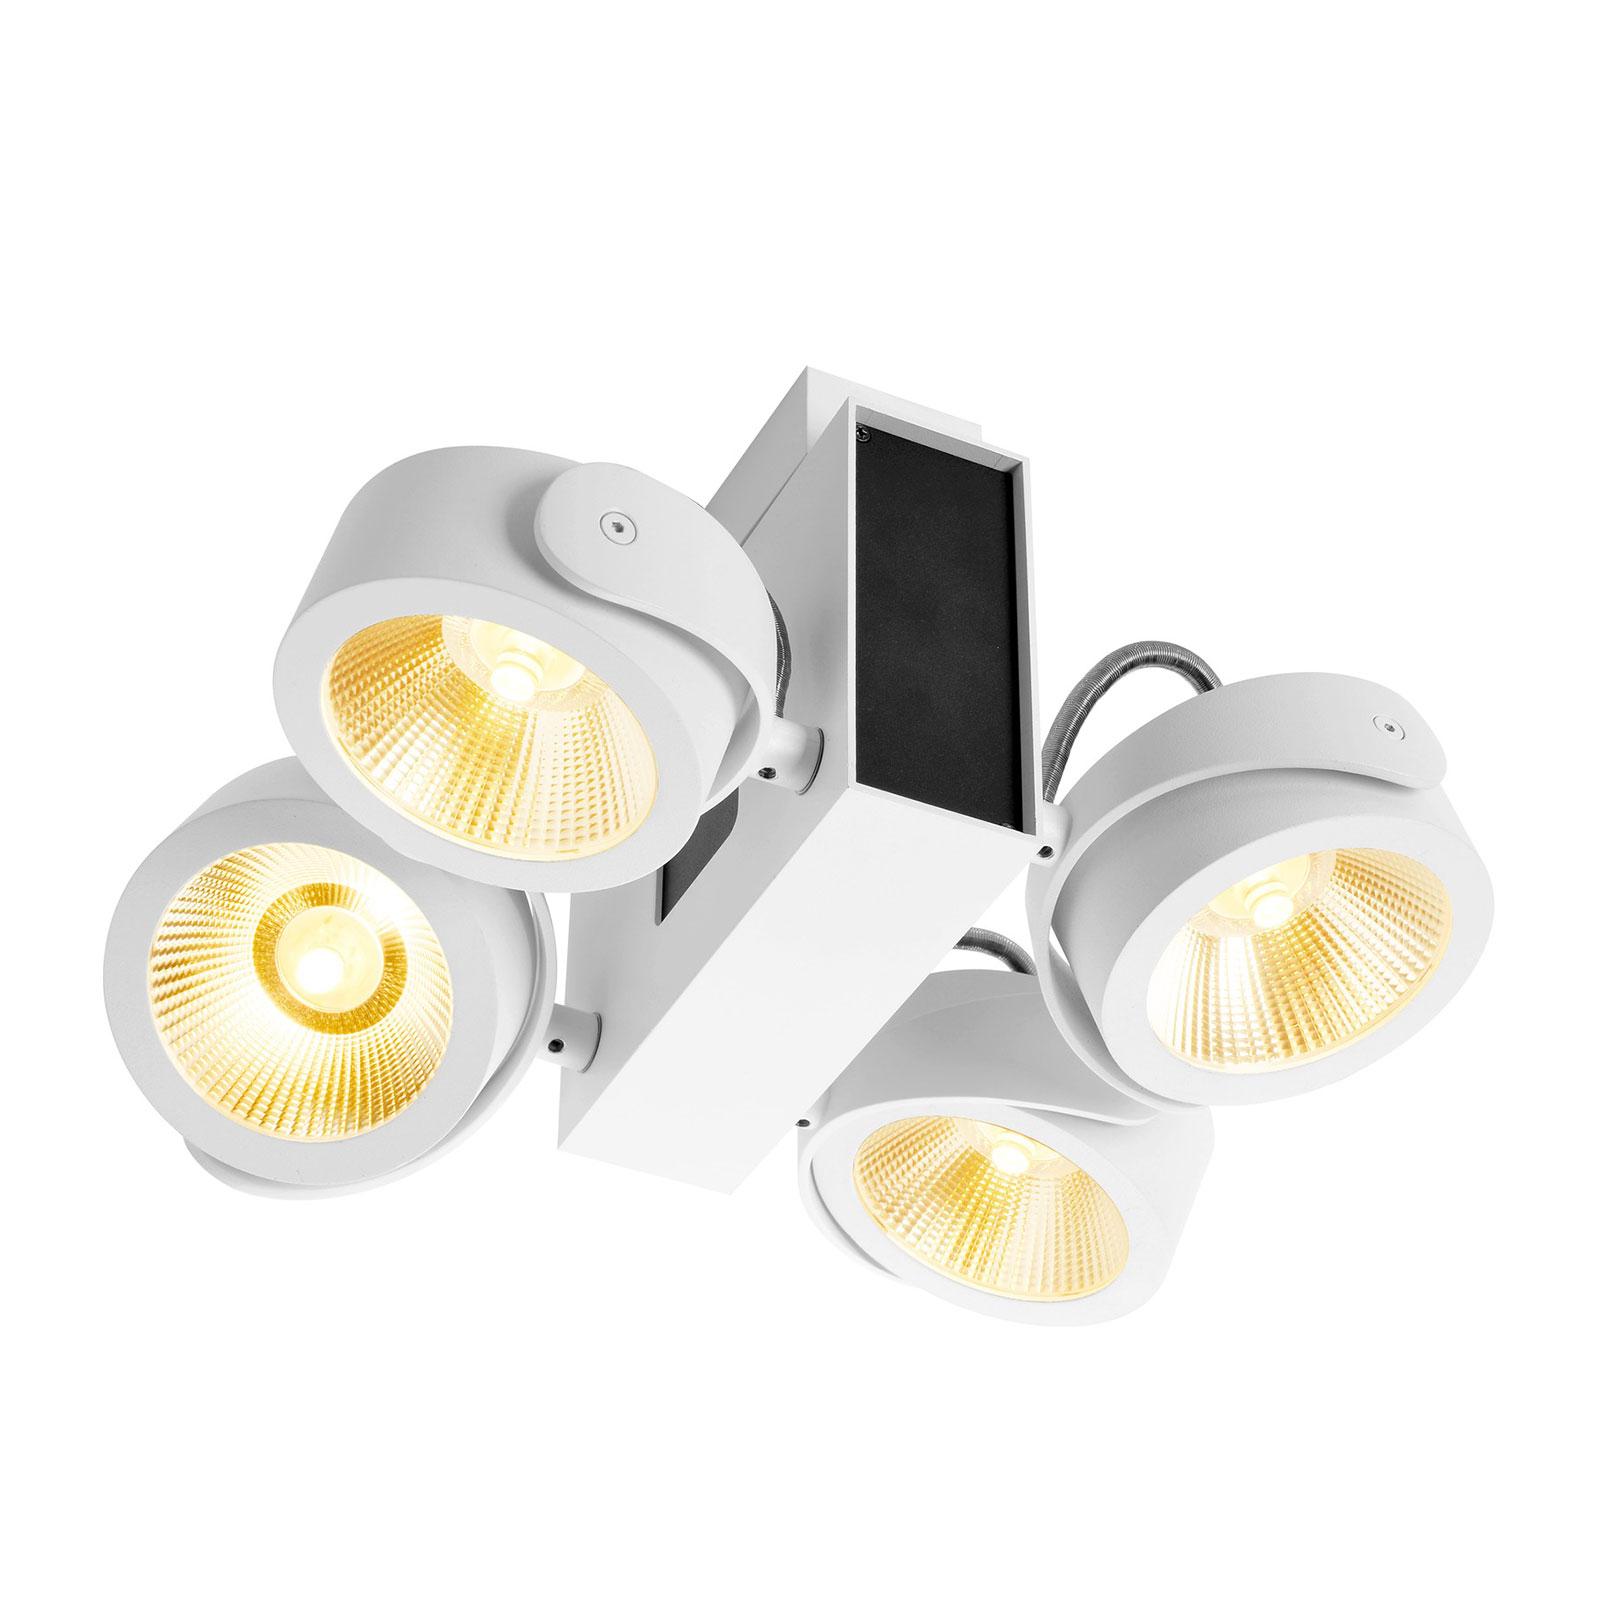 SLV Tec Kalu LED-Deckenstrahler 4-flammig, 24° s/w